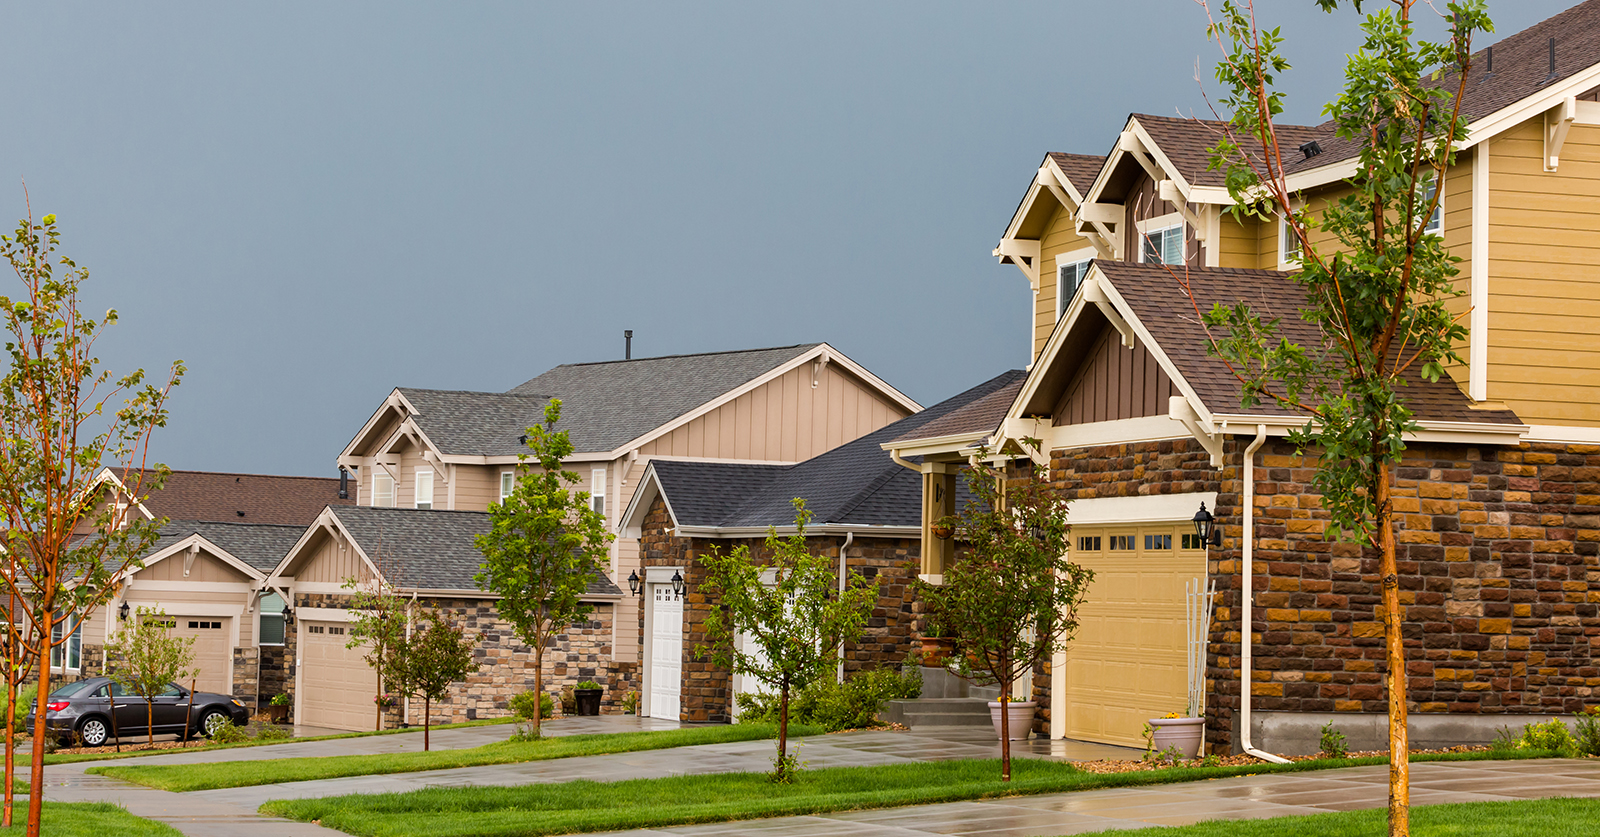 The Best Neighborhoods in Denver for Families